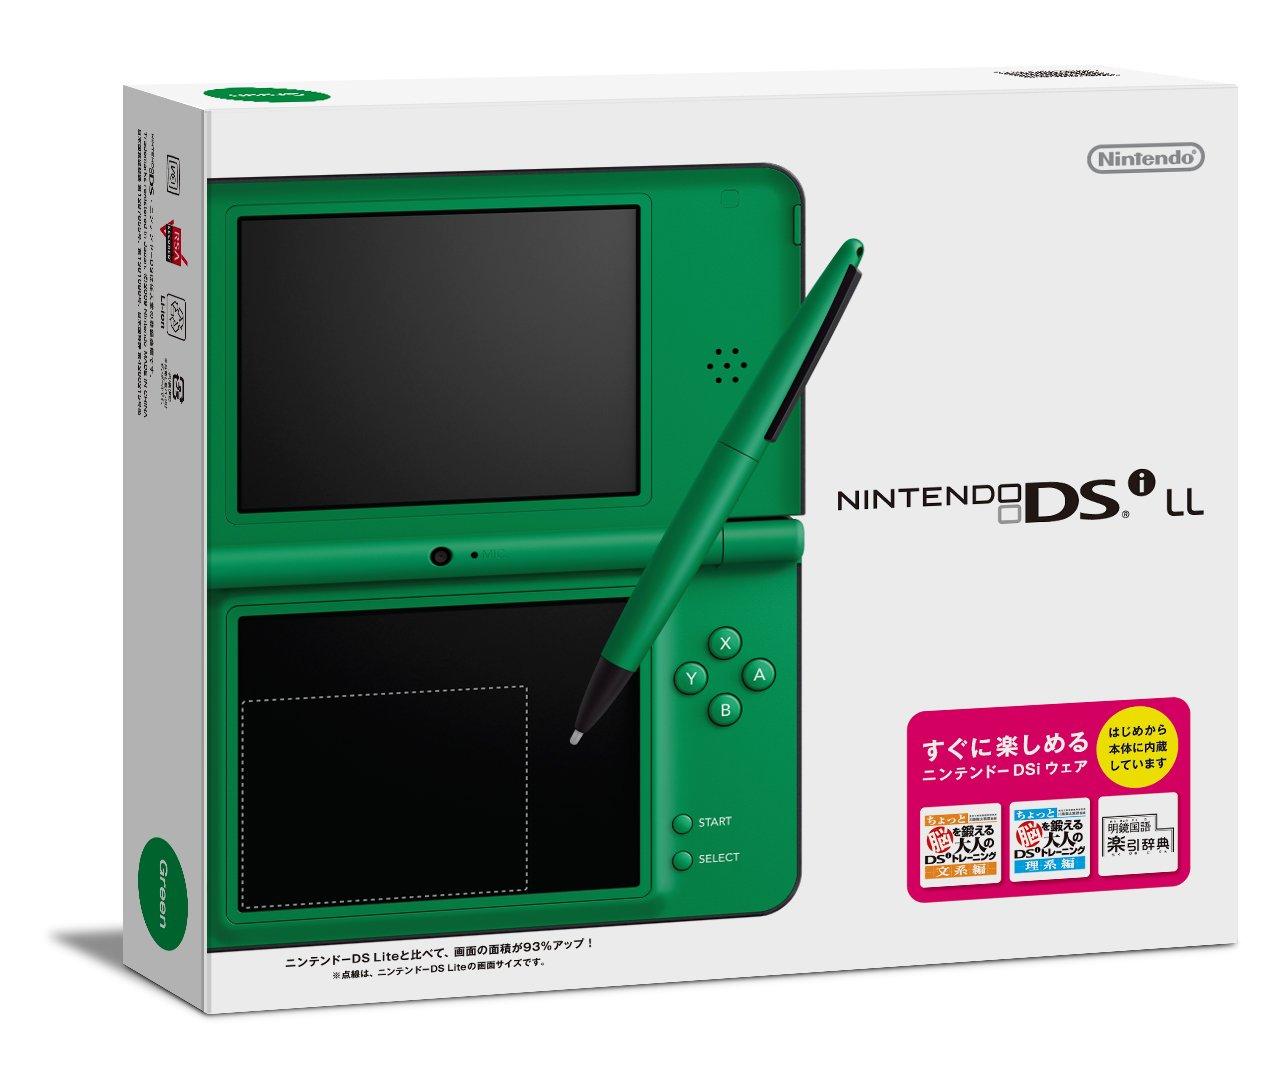 Green Nintendo DSi LL by Nintendo